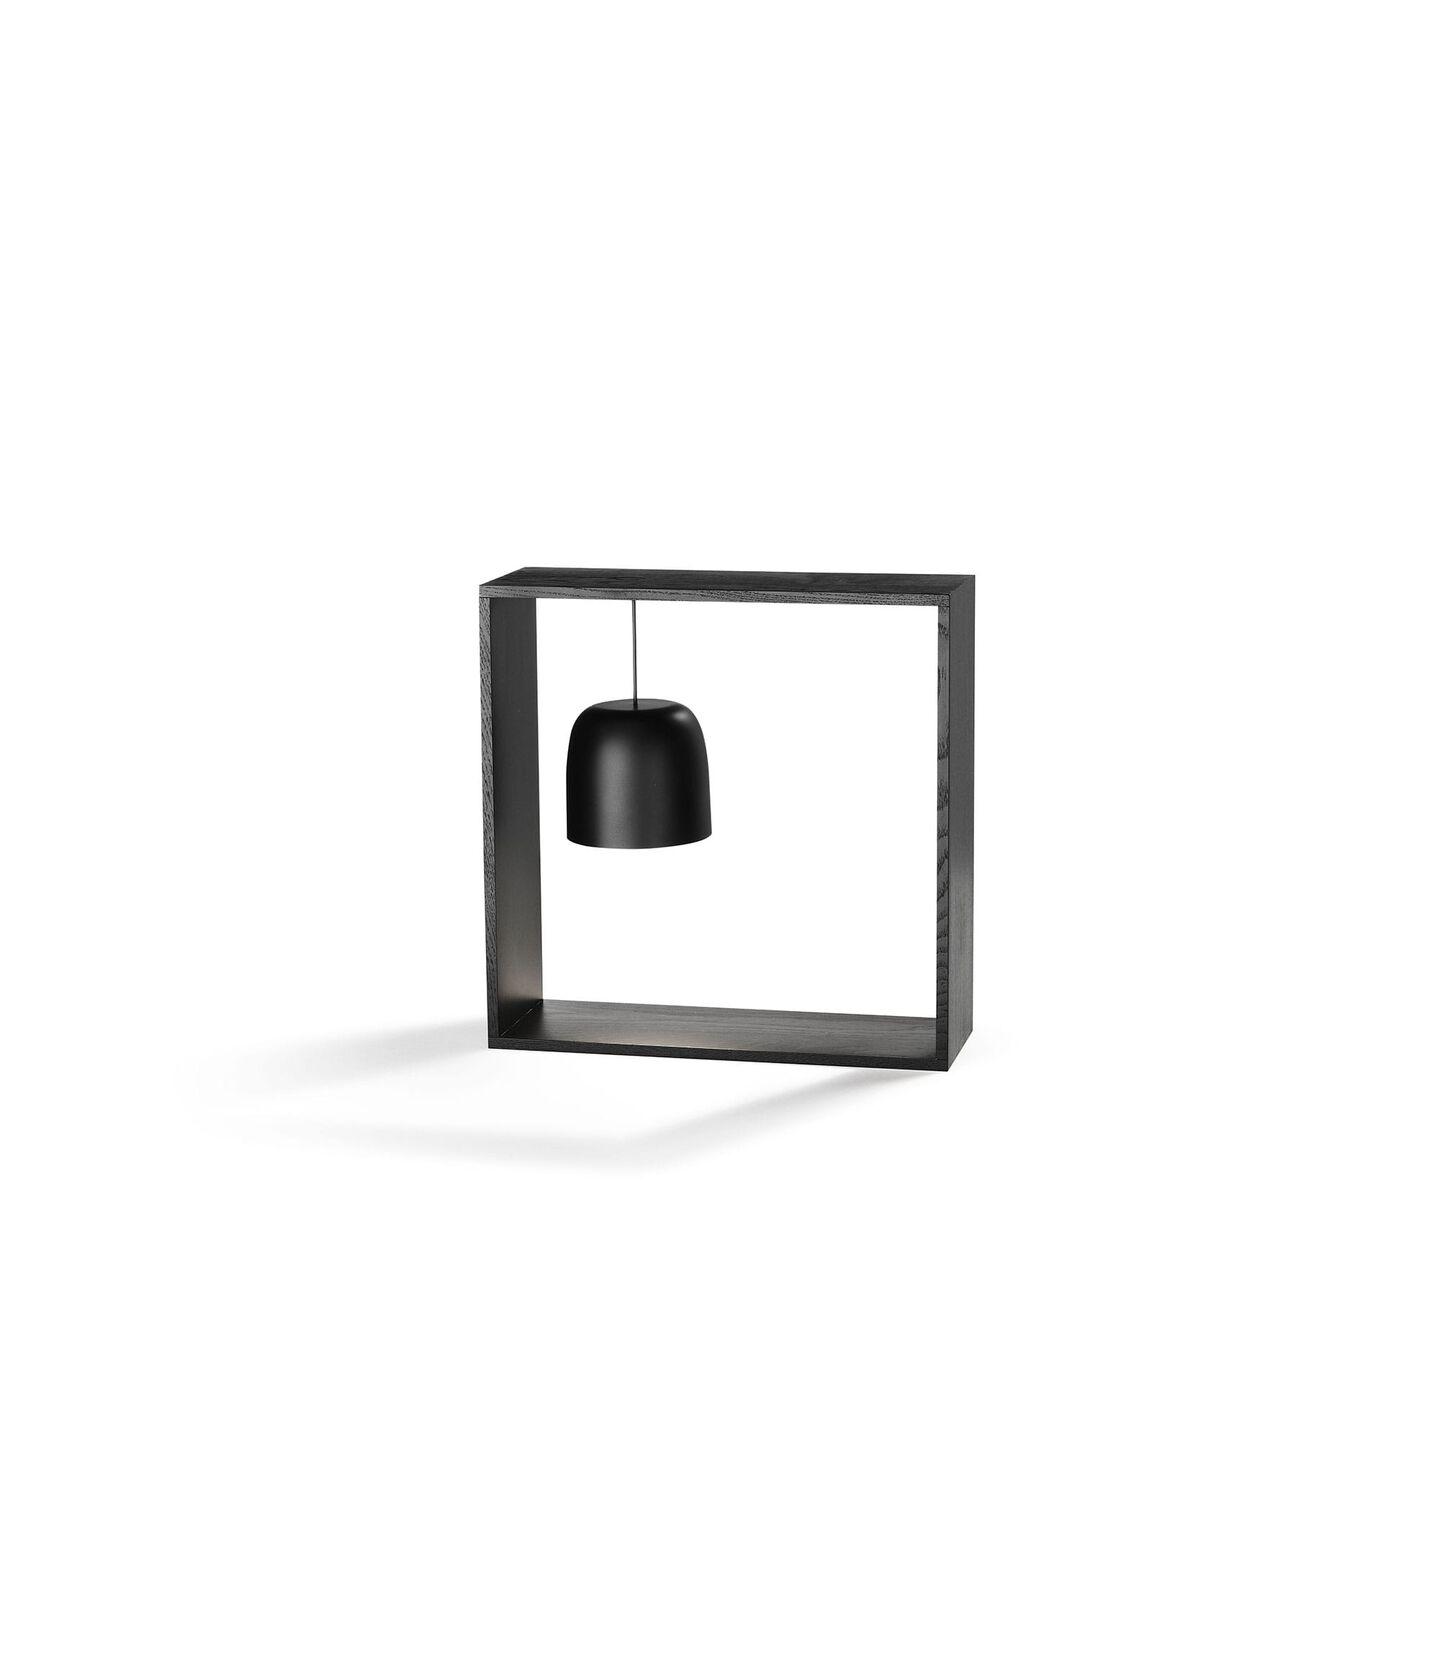 gaku-wire-table-nendo-flos-F2521030product-still-life-big-